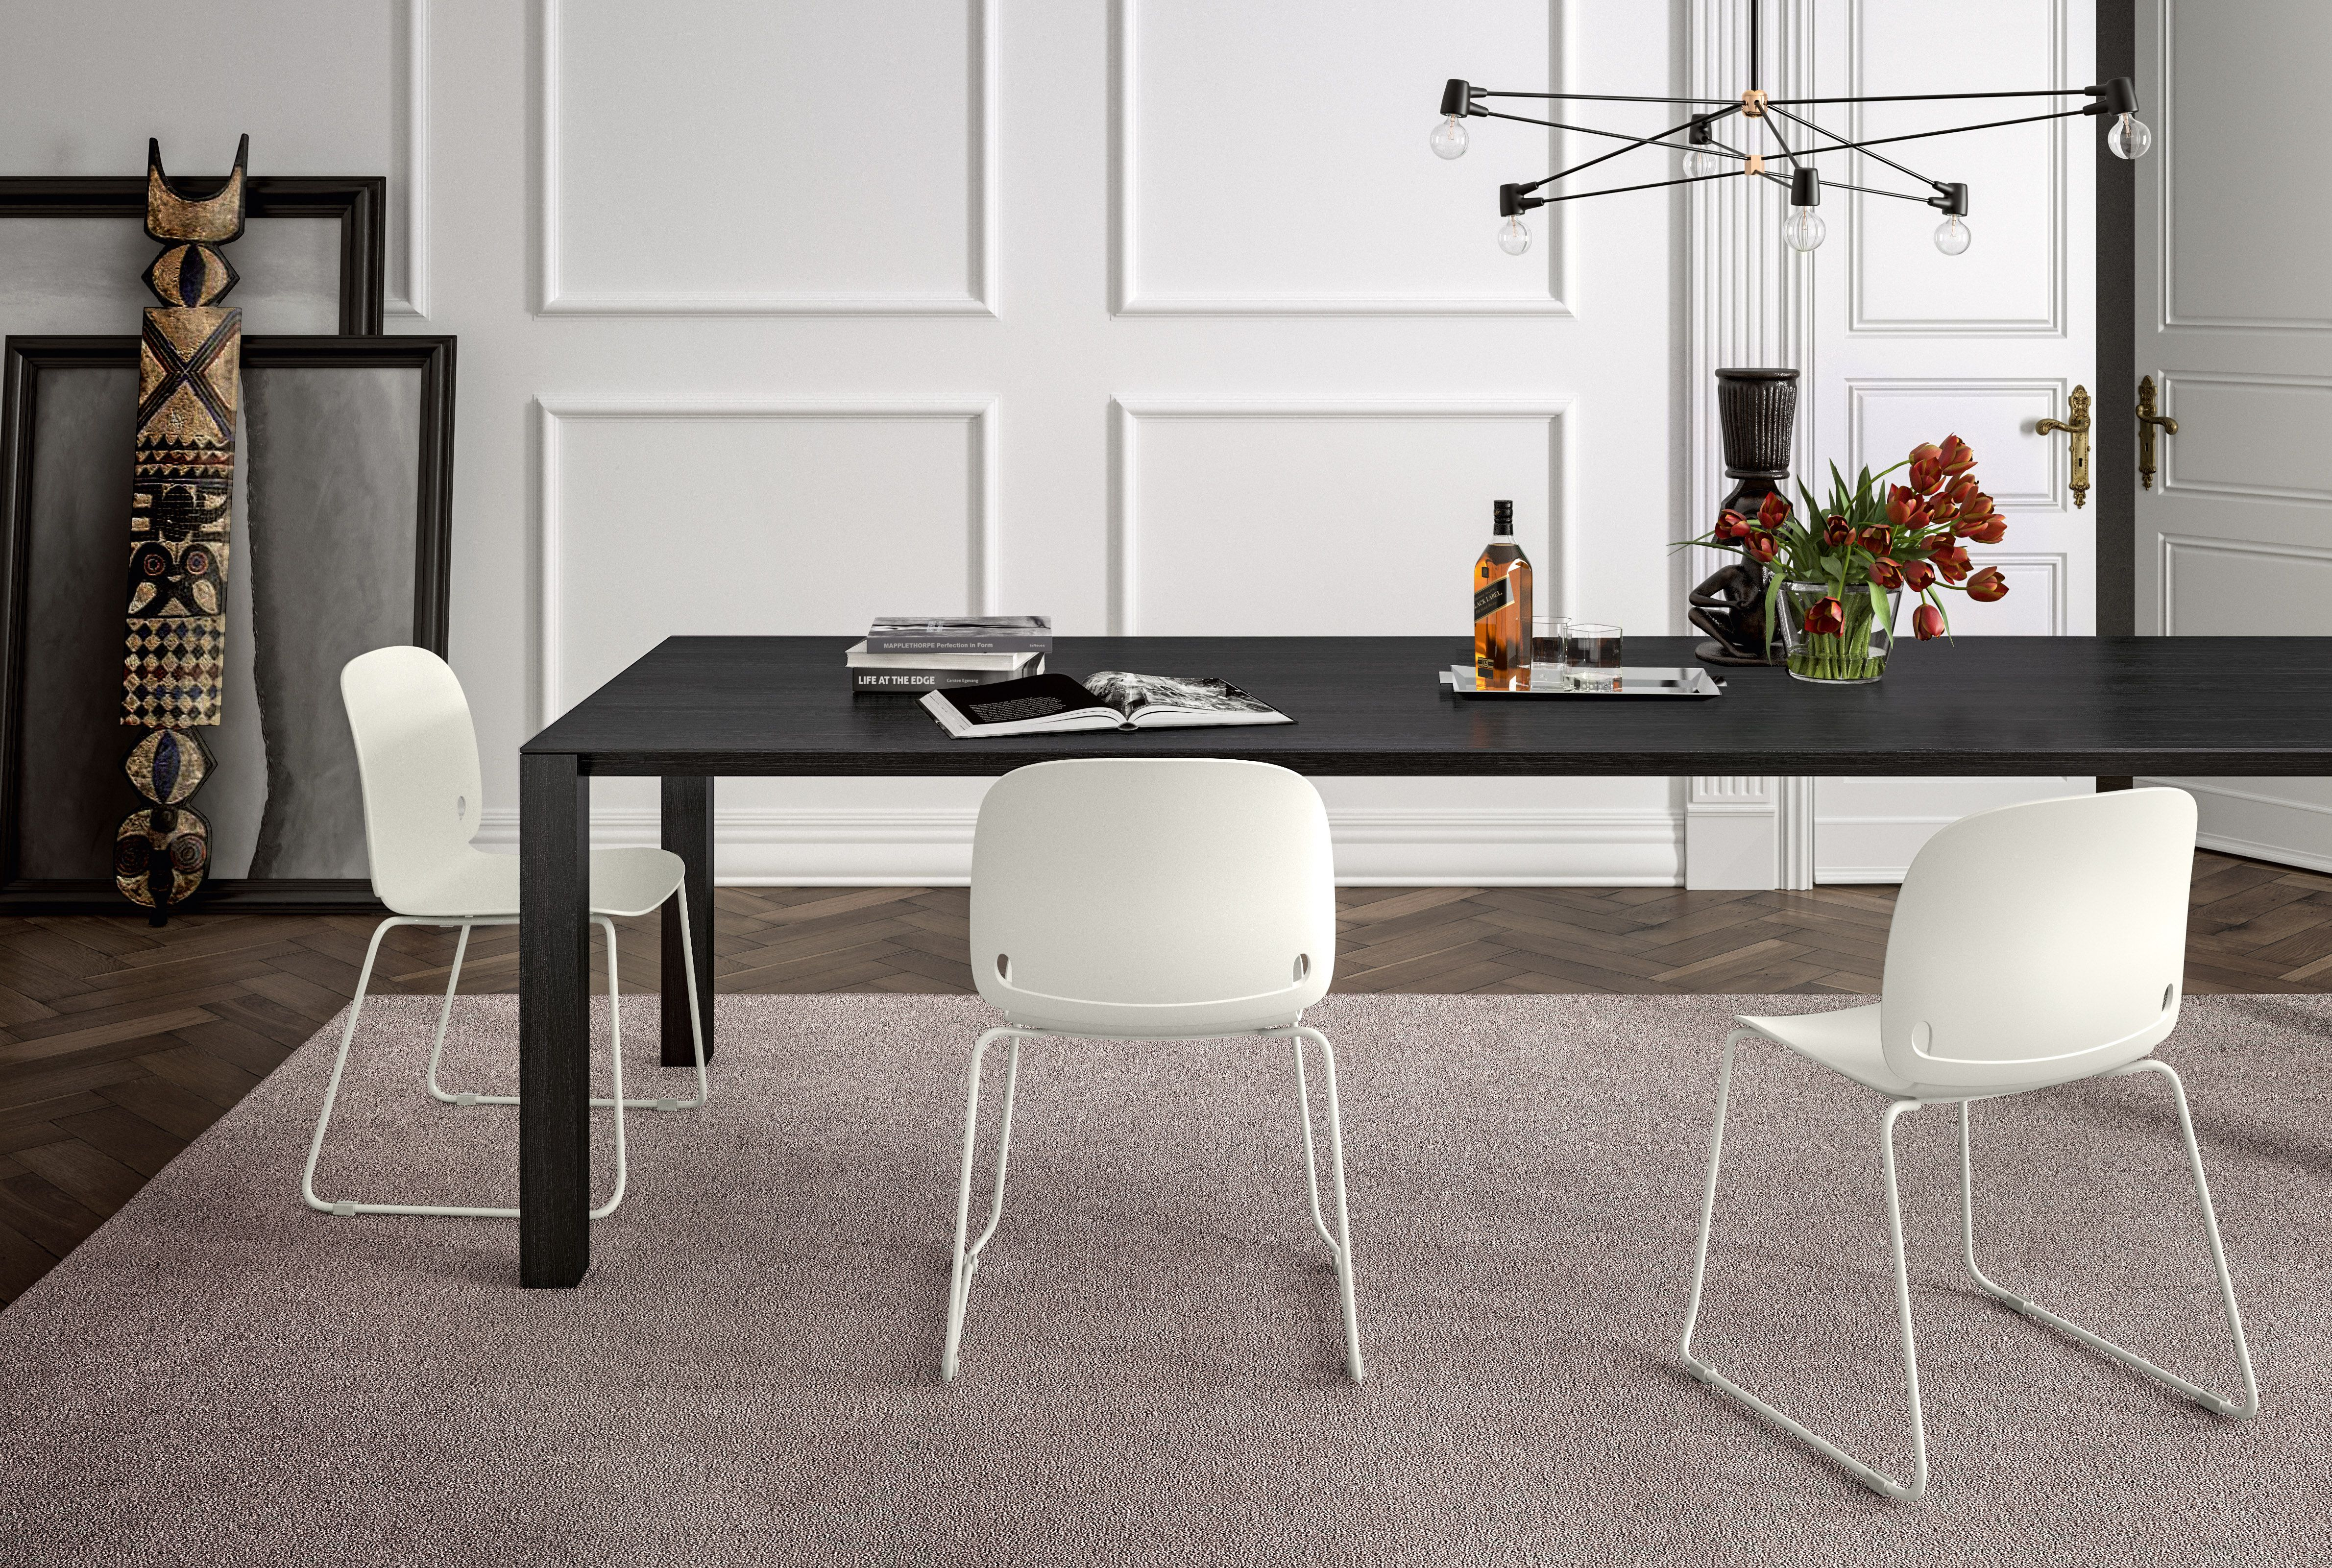 Fattorini sedie ~ Intro chair design by odo fioravanti pianca sedie chairs